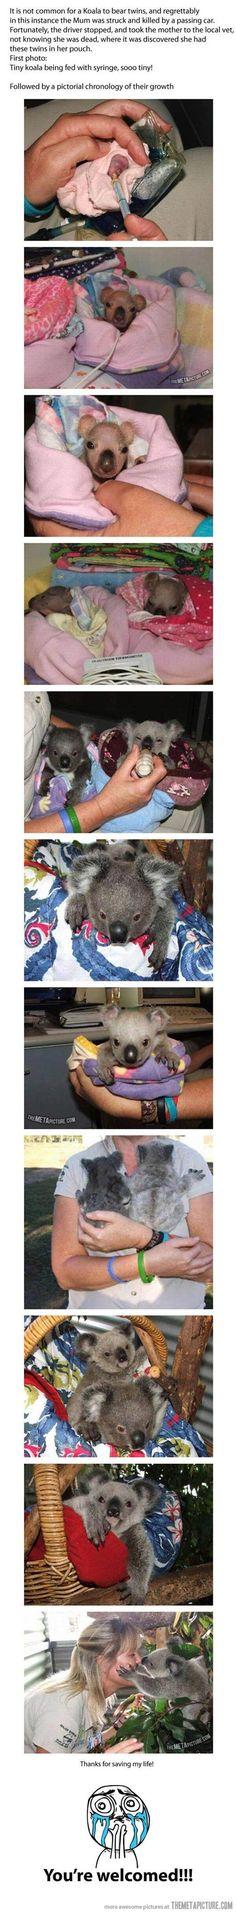 Los koalas rescate ...